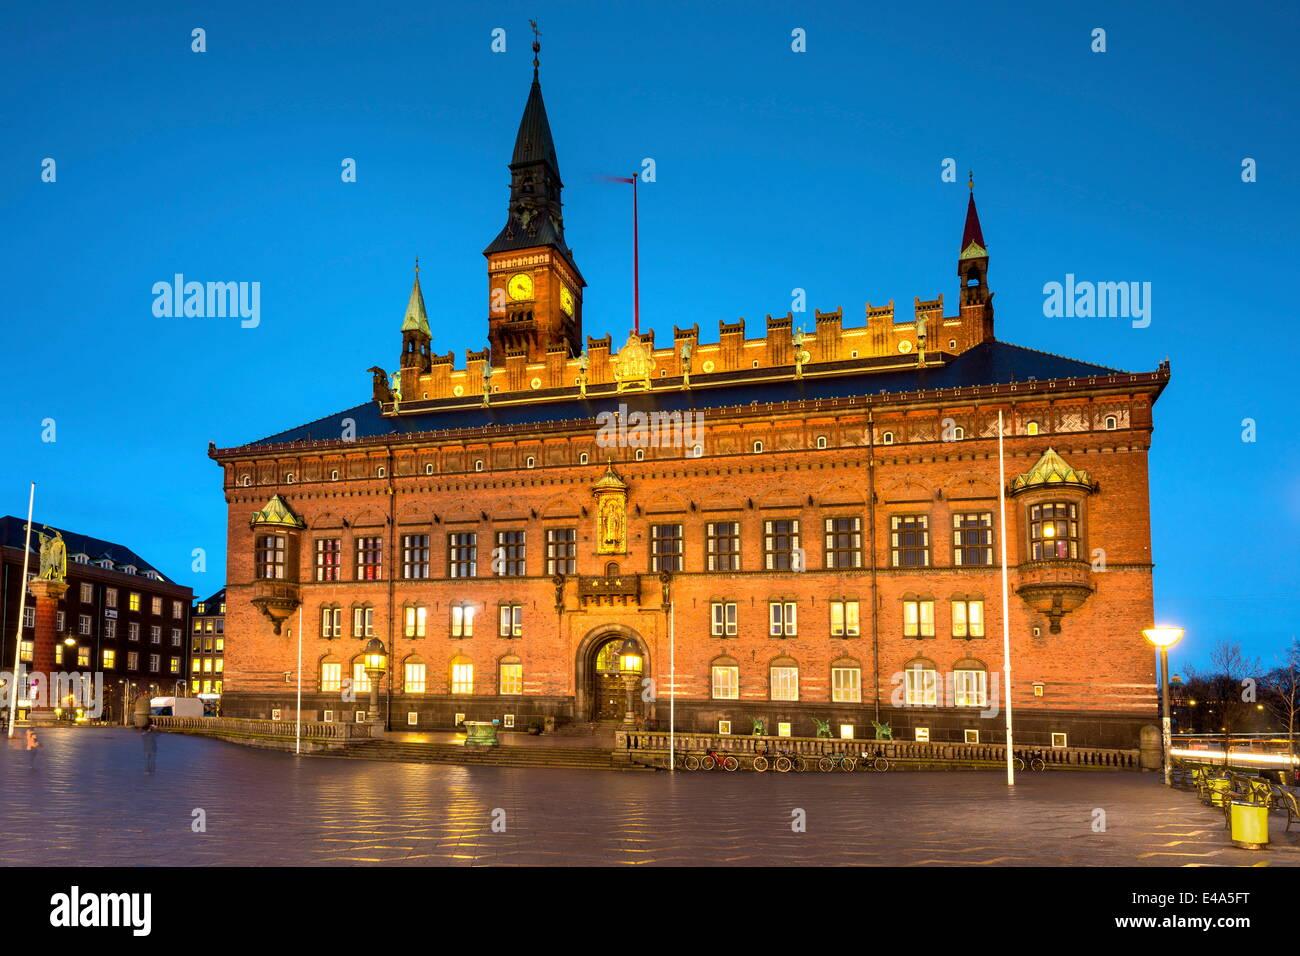 Copenhagen City Hall illuminata al crepuscolo, Copenhagen, Danimarca, in Scandinavia, Europa Immagini Stock